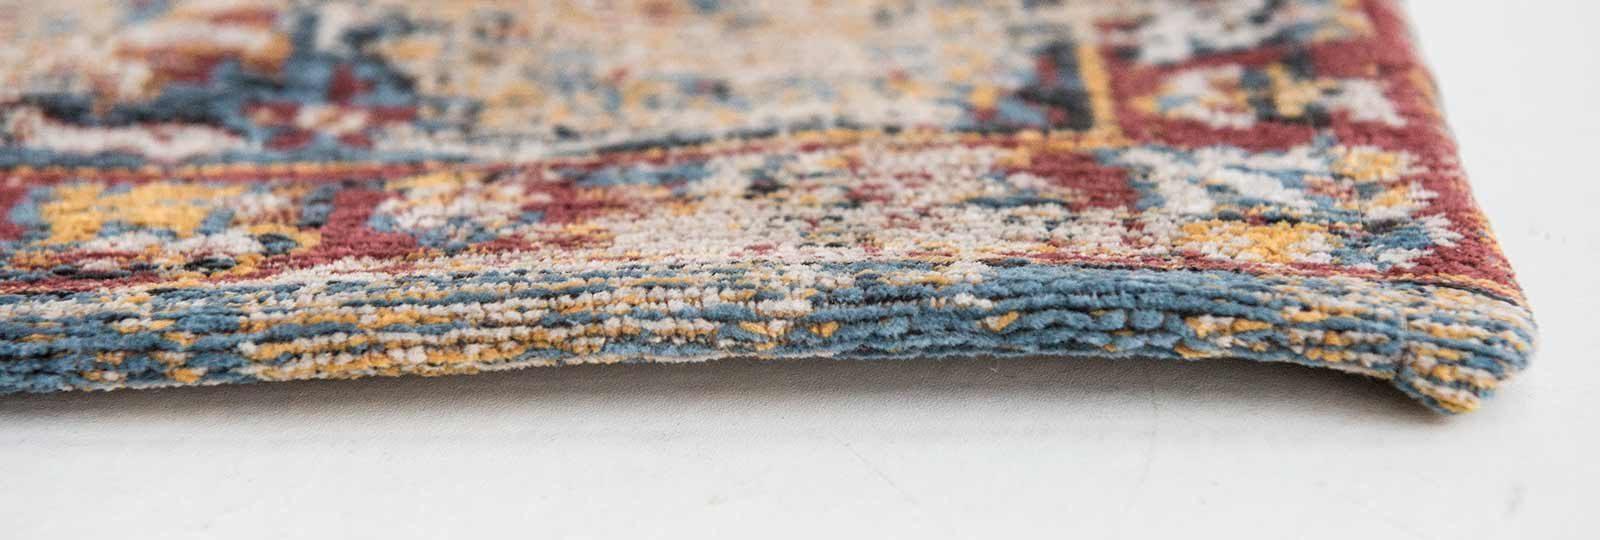 rugs Louis De Poortere LX8713 Antiquarian Antique Bakthiari Khedive Multi side